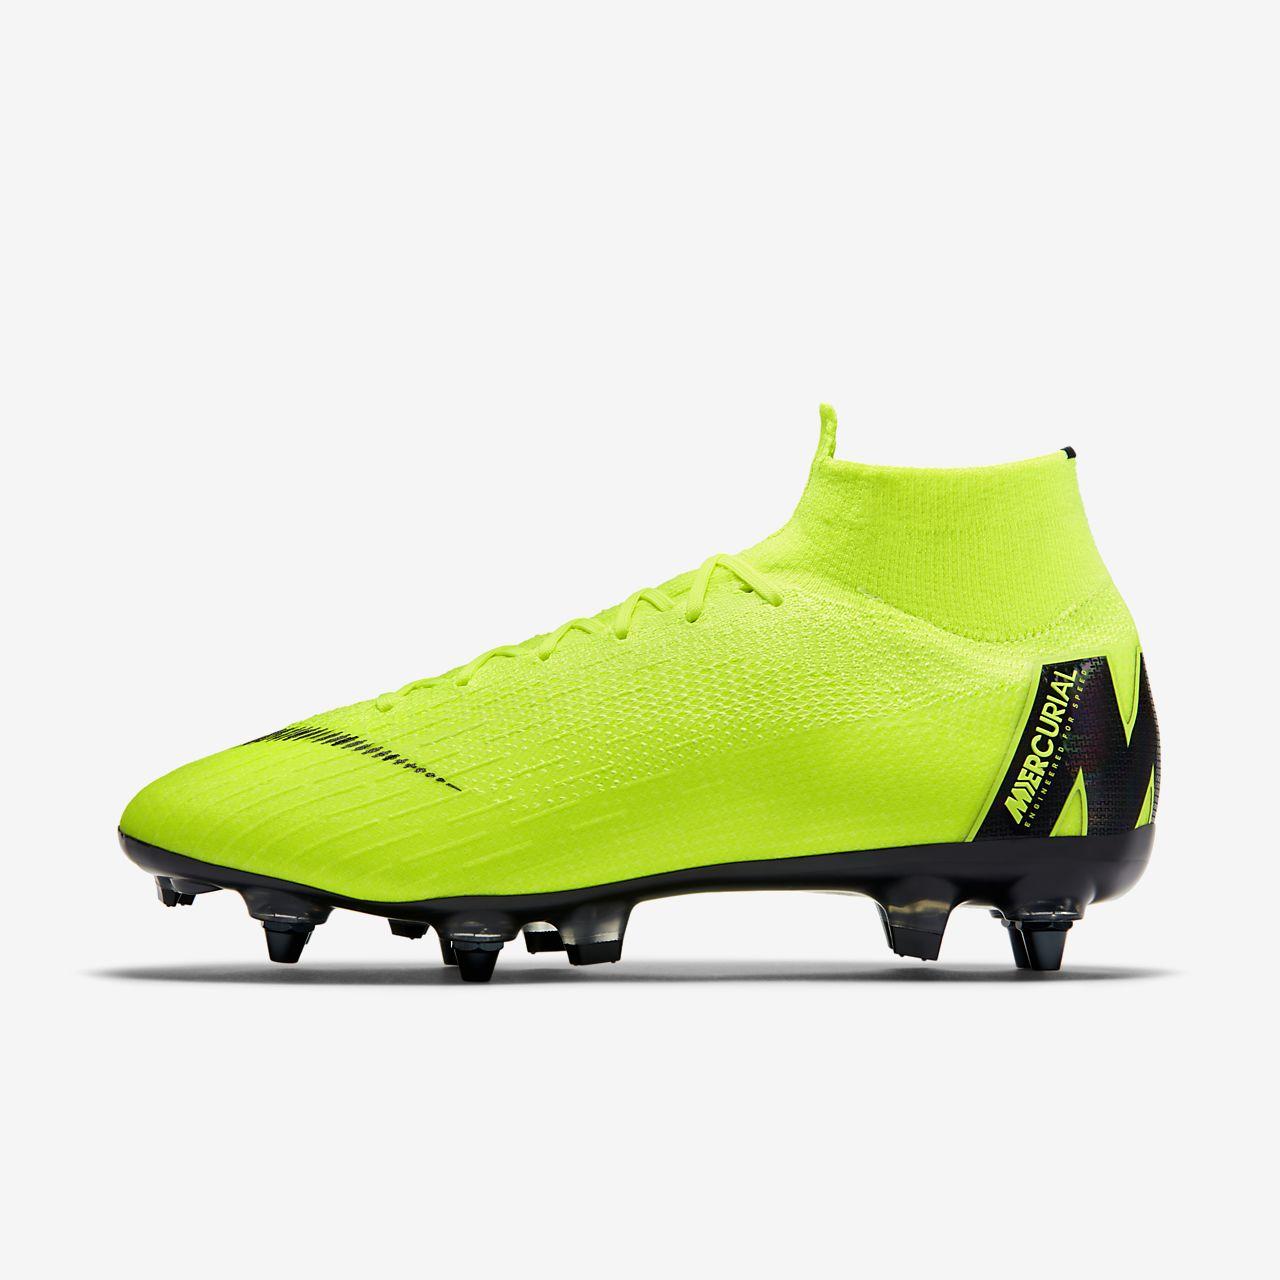 pretty nice f61c3 64543 ... Chaussure de football à crampons pour terrain gras Nike Mercurial  Superfly 360 Elite SG-PRO